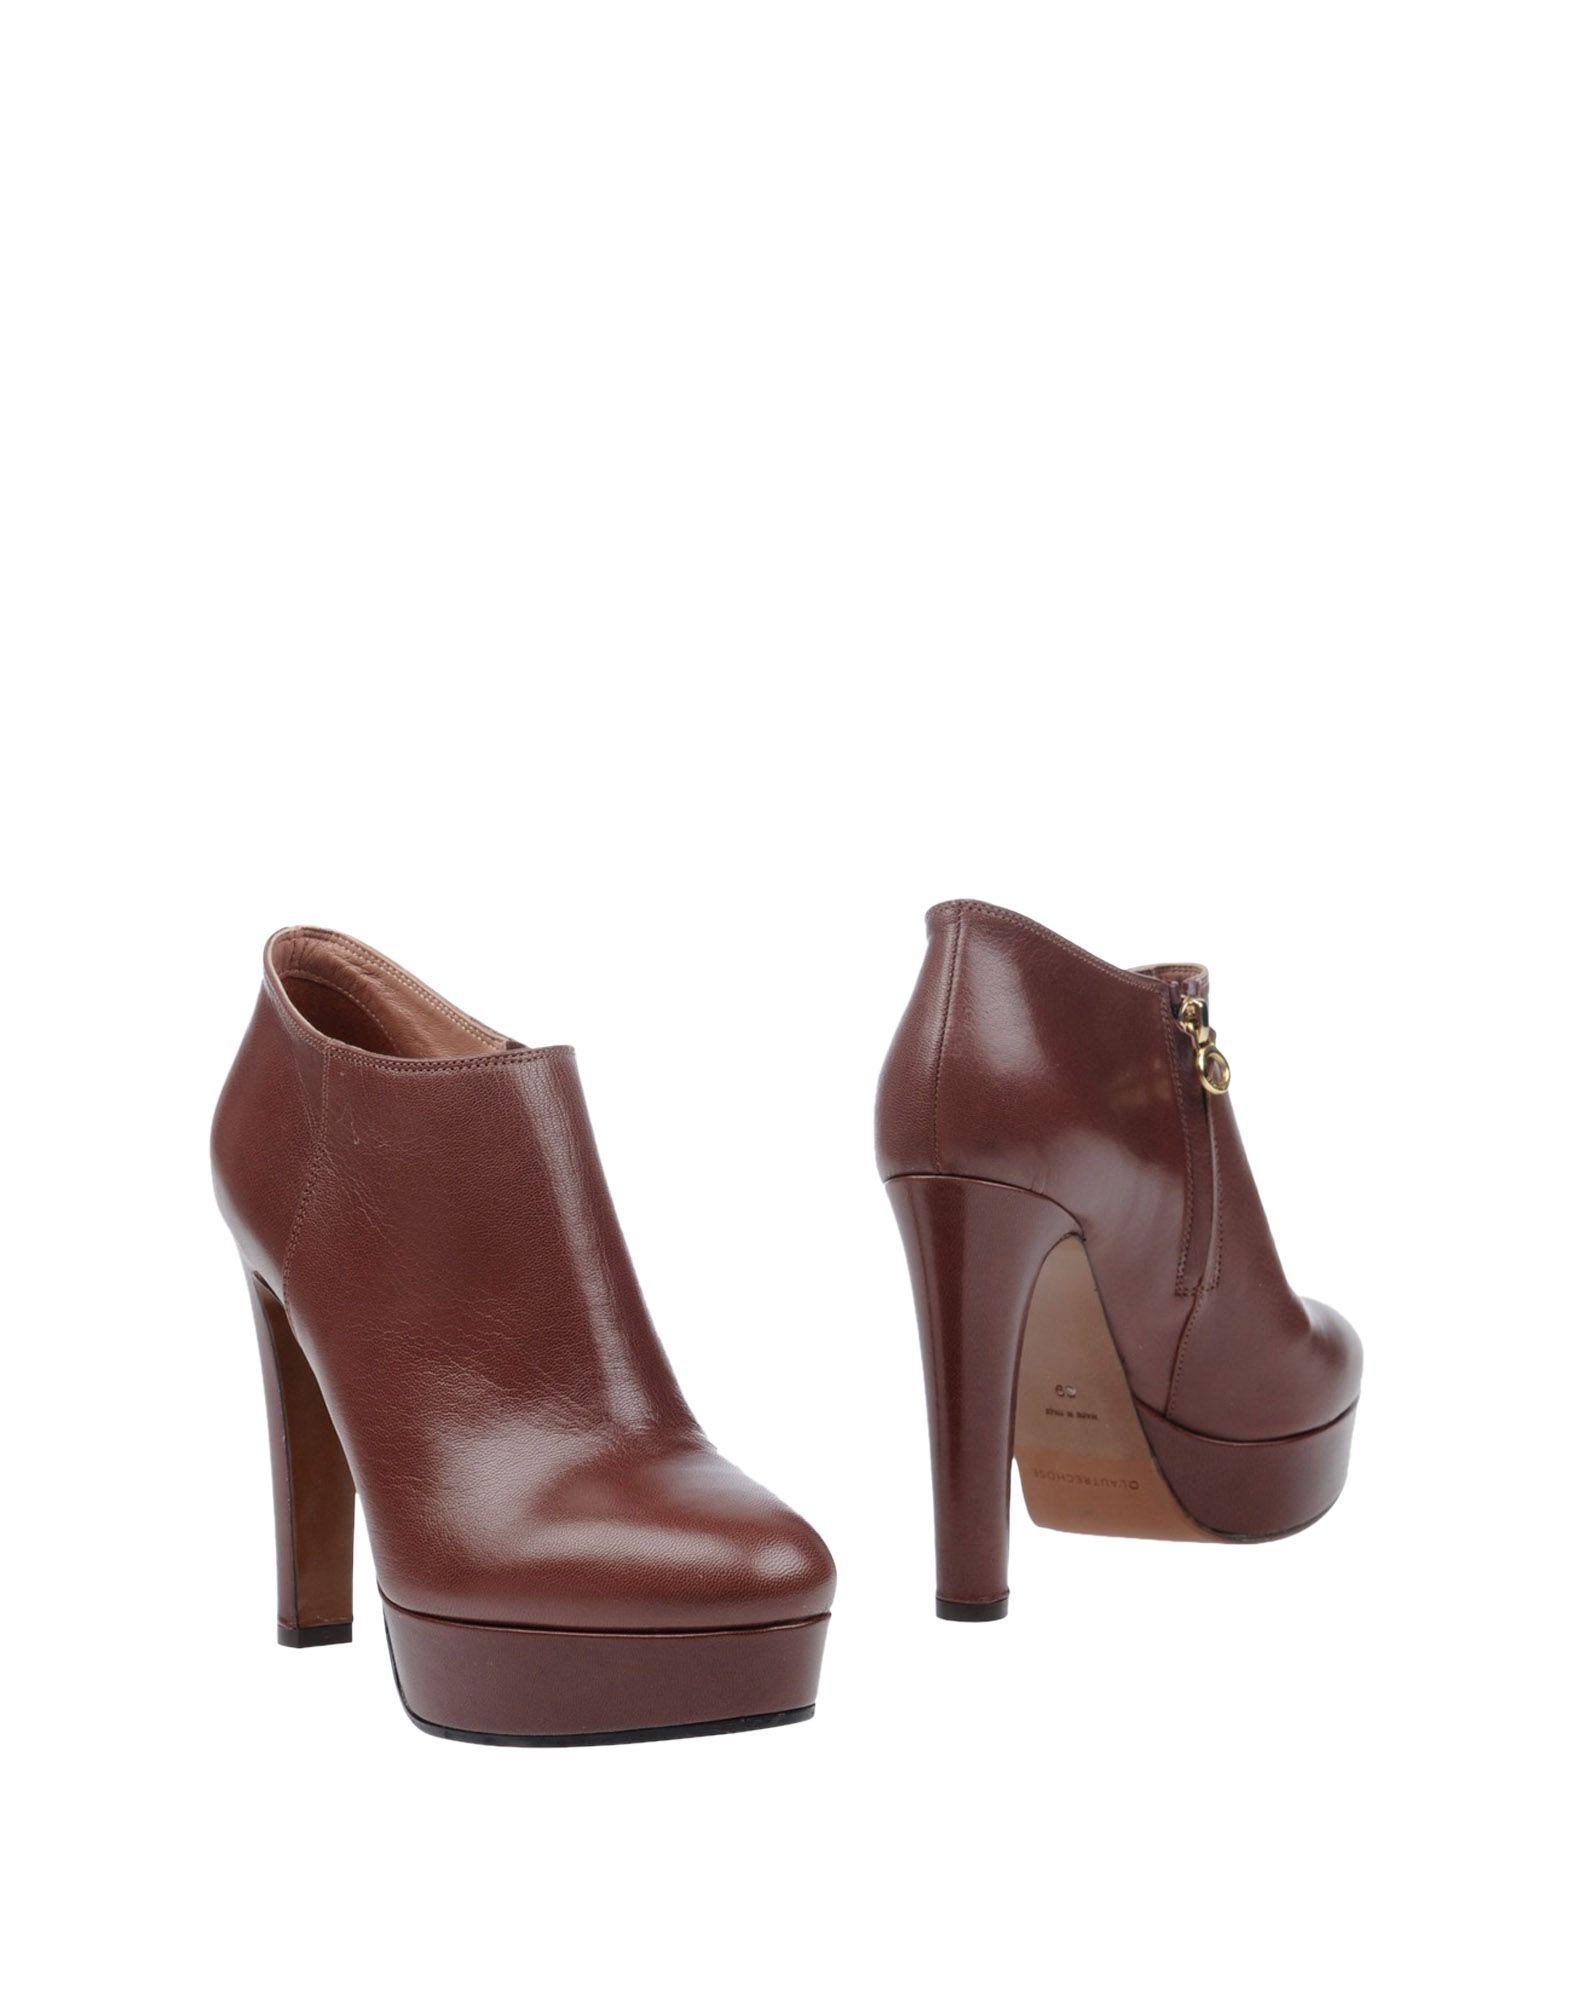 Rabatt Schuhe L' Autre Chose Stiefelette Damen  11263789GN